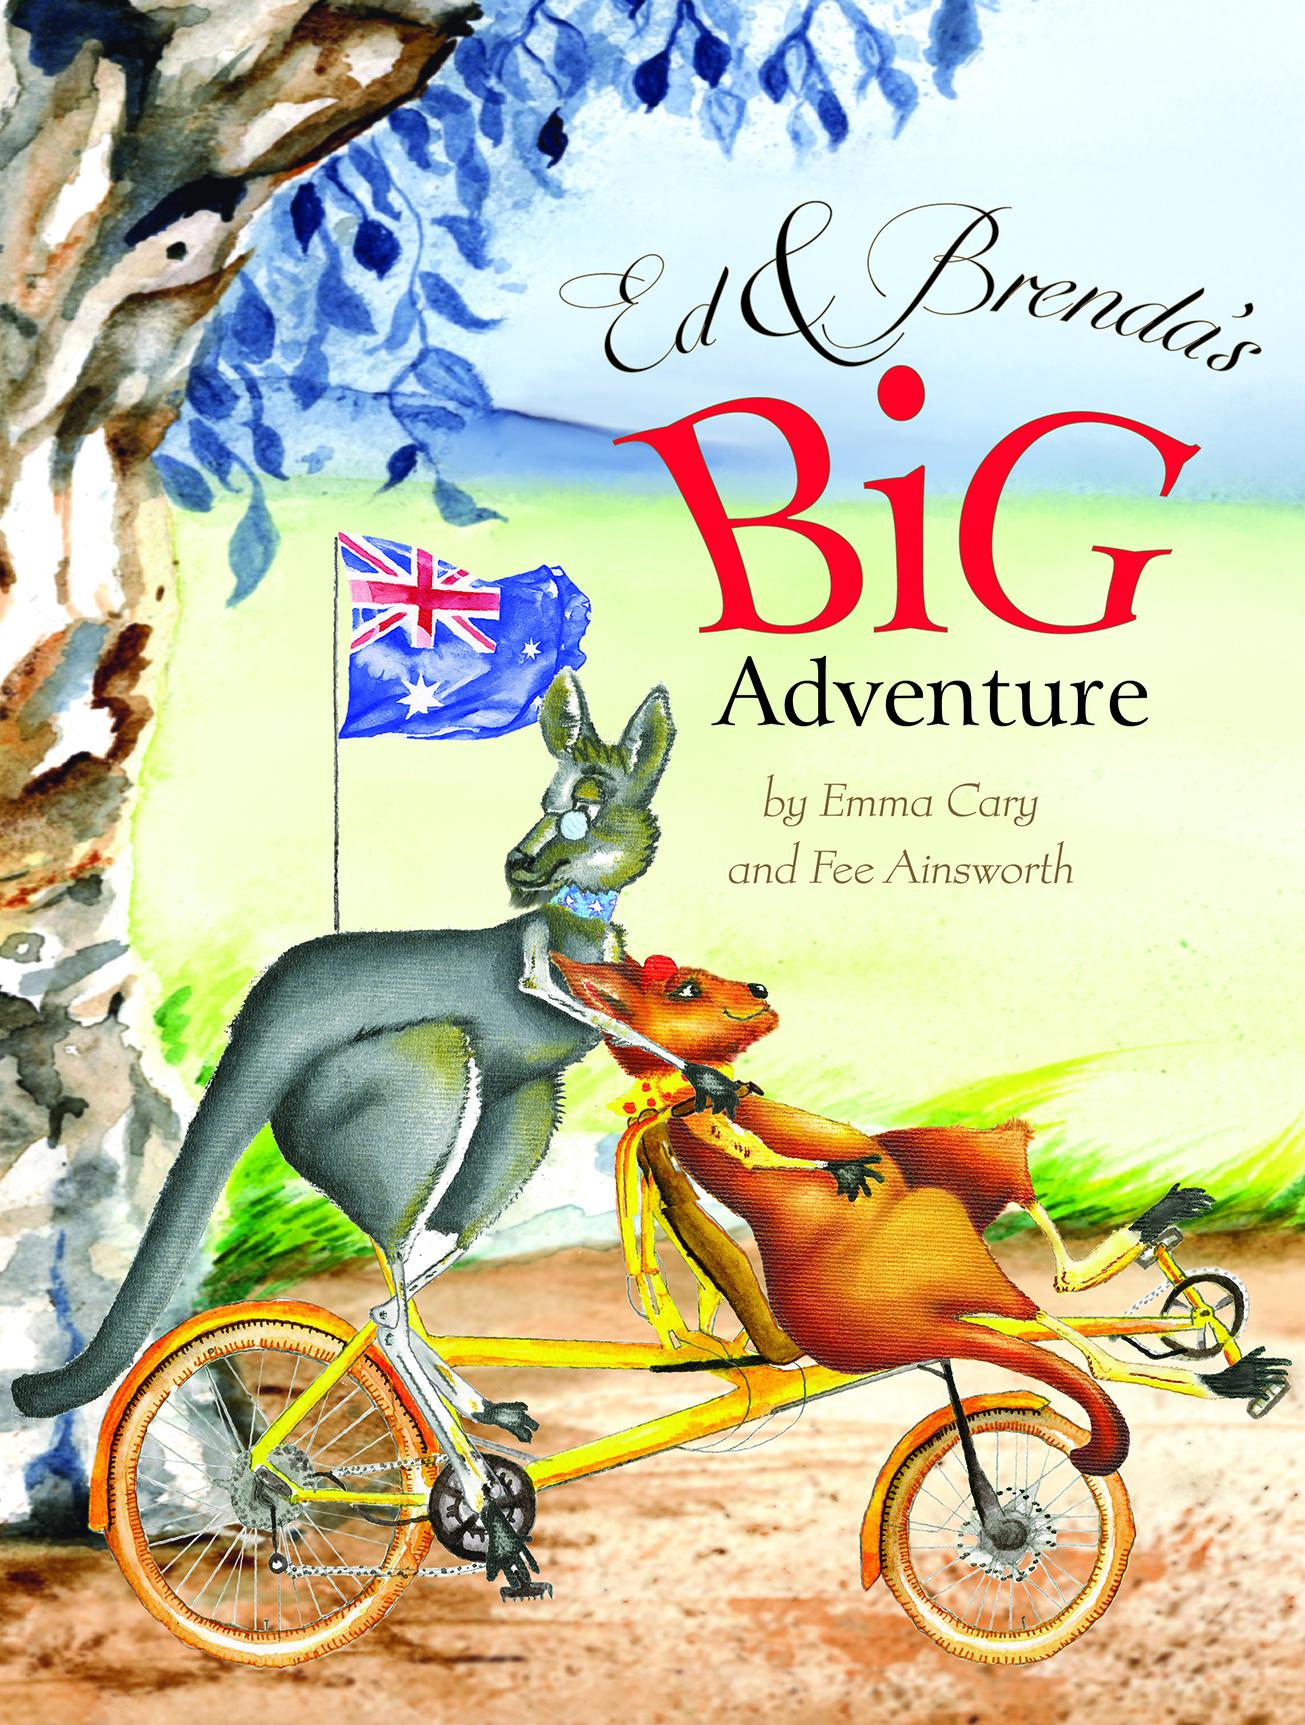 Ed & Brenda's BIG Adventure - COVER